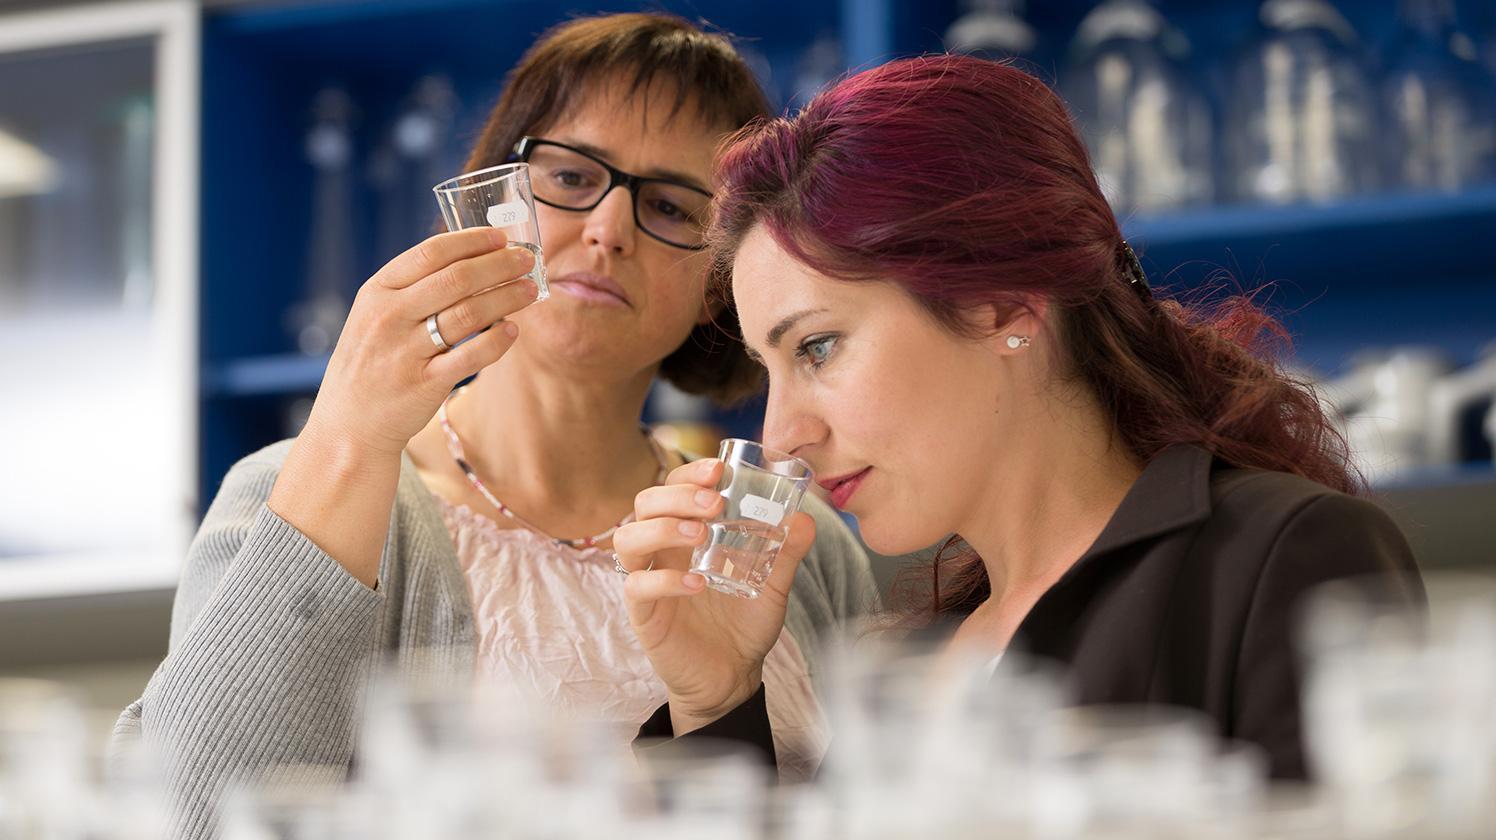 brita_experience_history_employees_sensory_laboratory_landscape